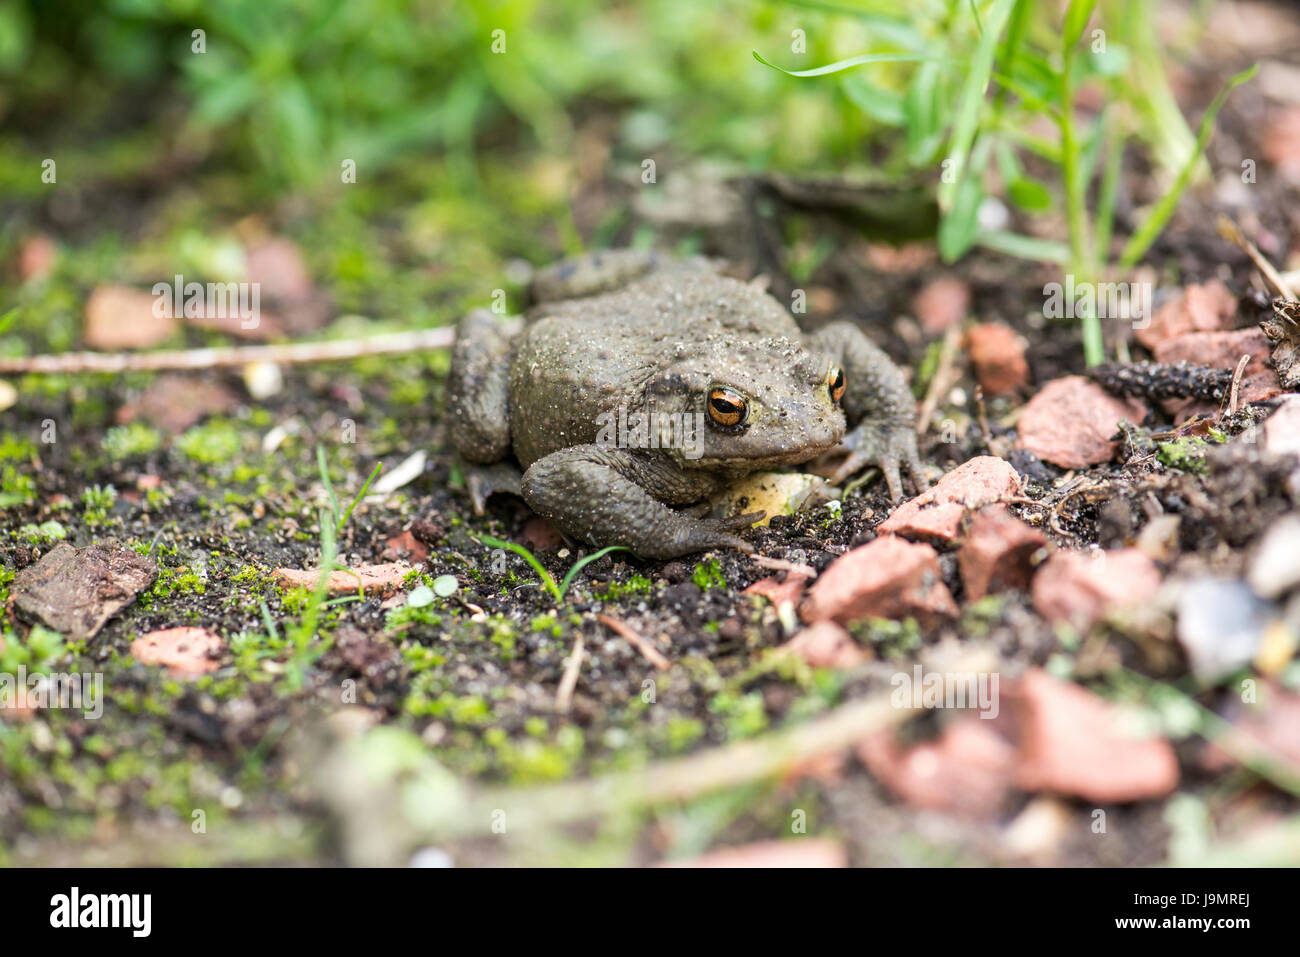 Common toad (Bufo bufo) - Stock Image